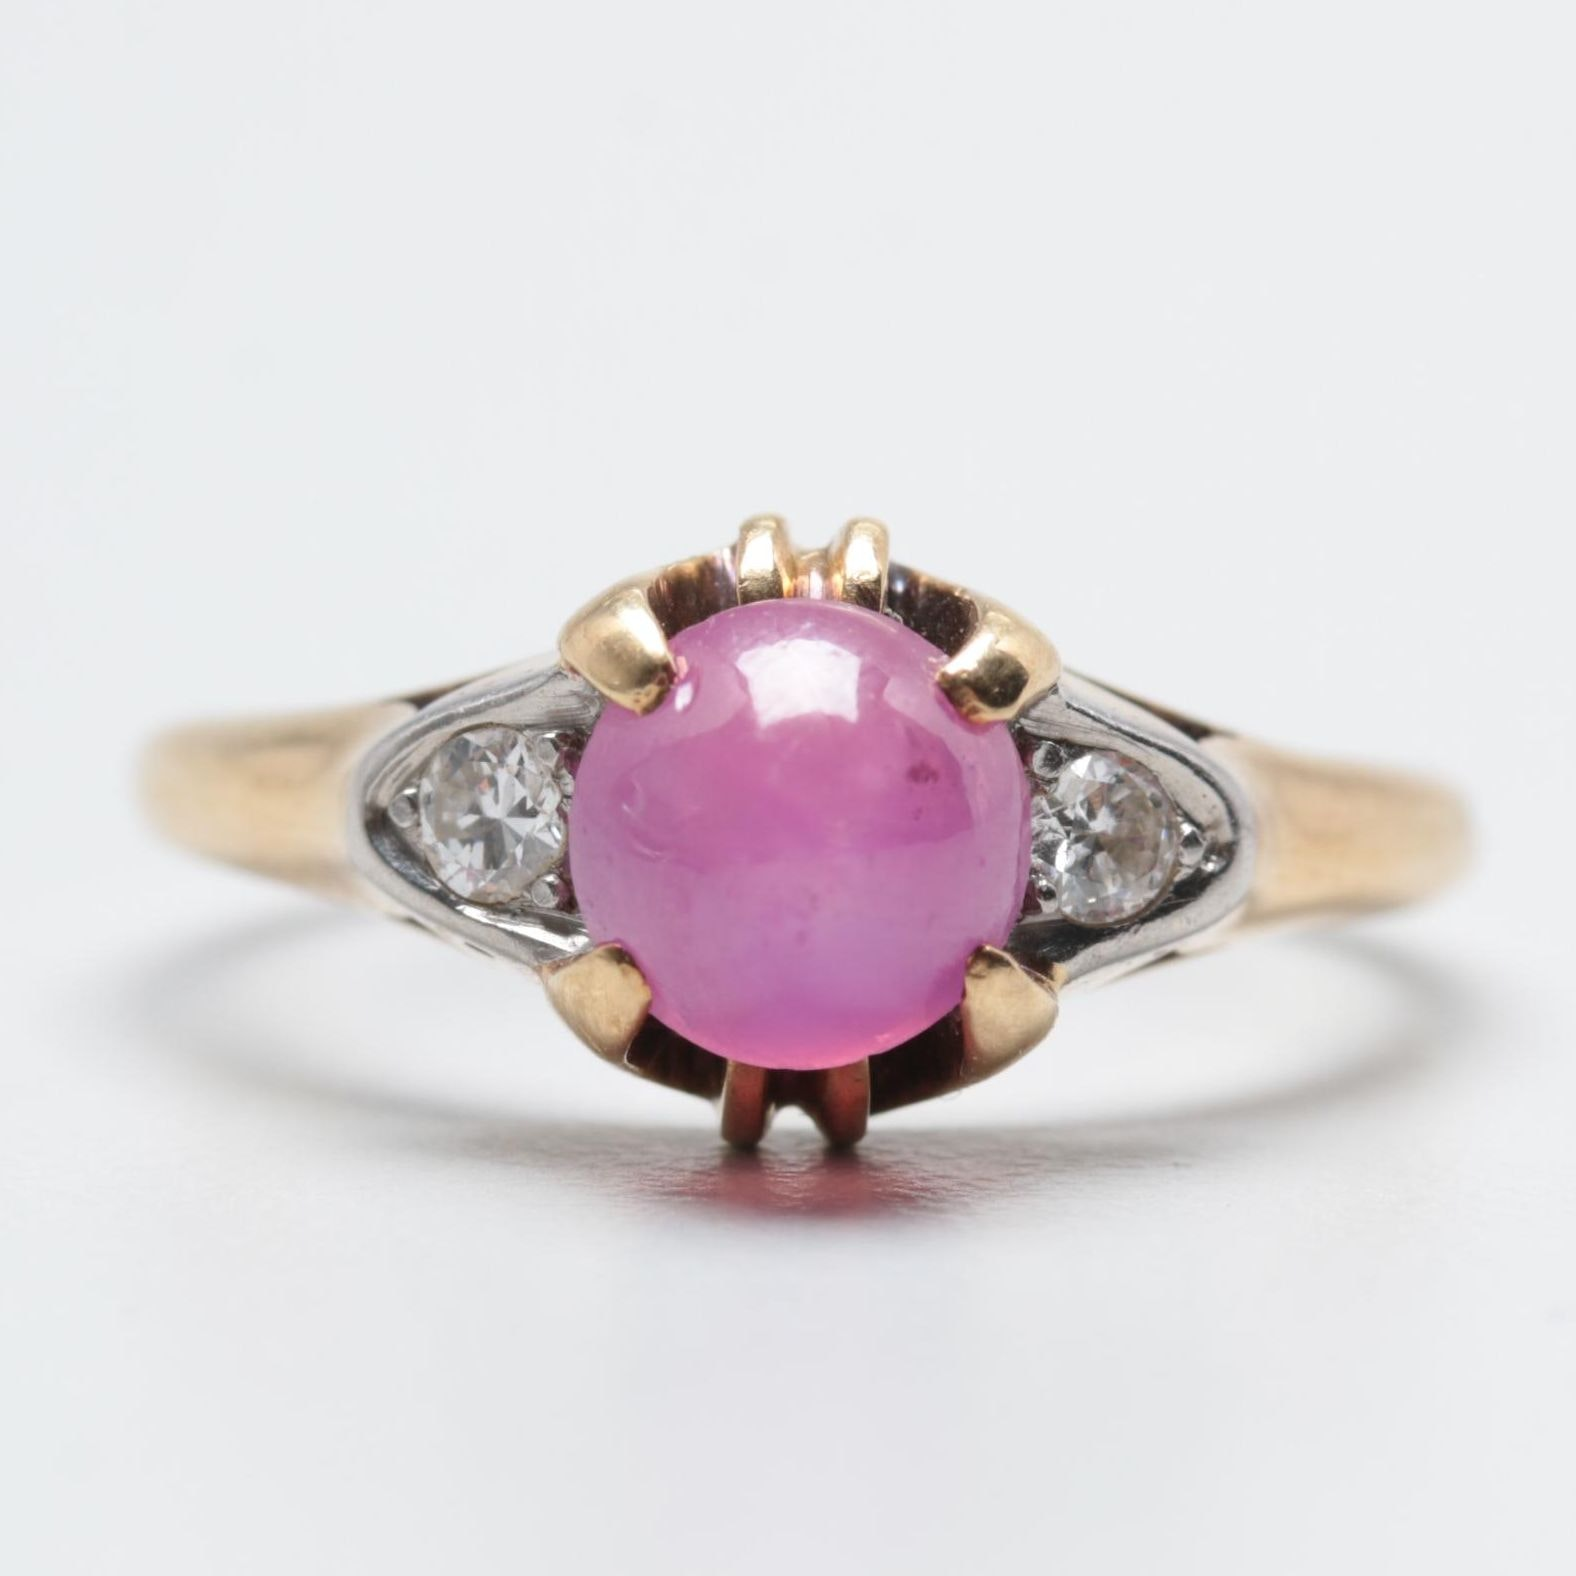 14K Yellow Gold and Palladium 1.89 CT Star Ruby and Diamond Ring